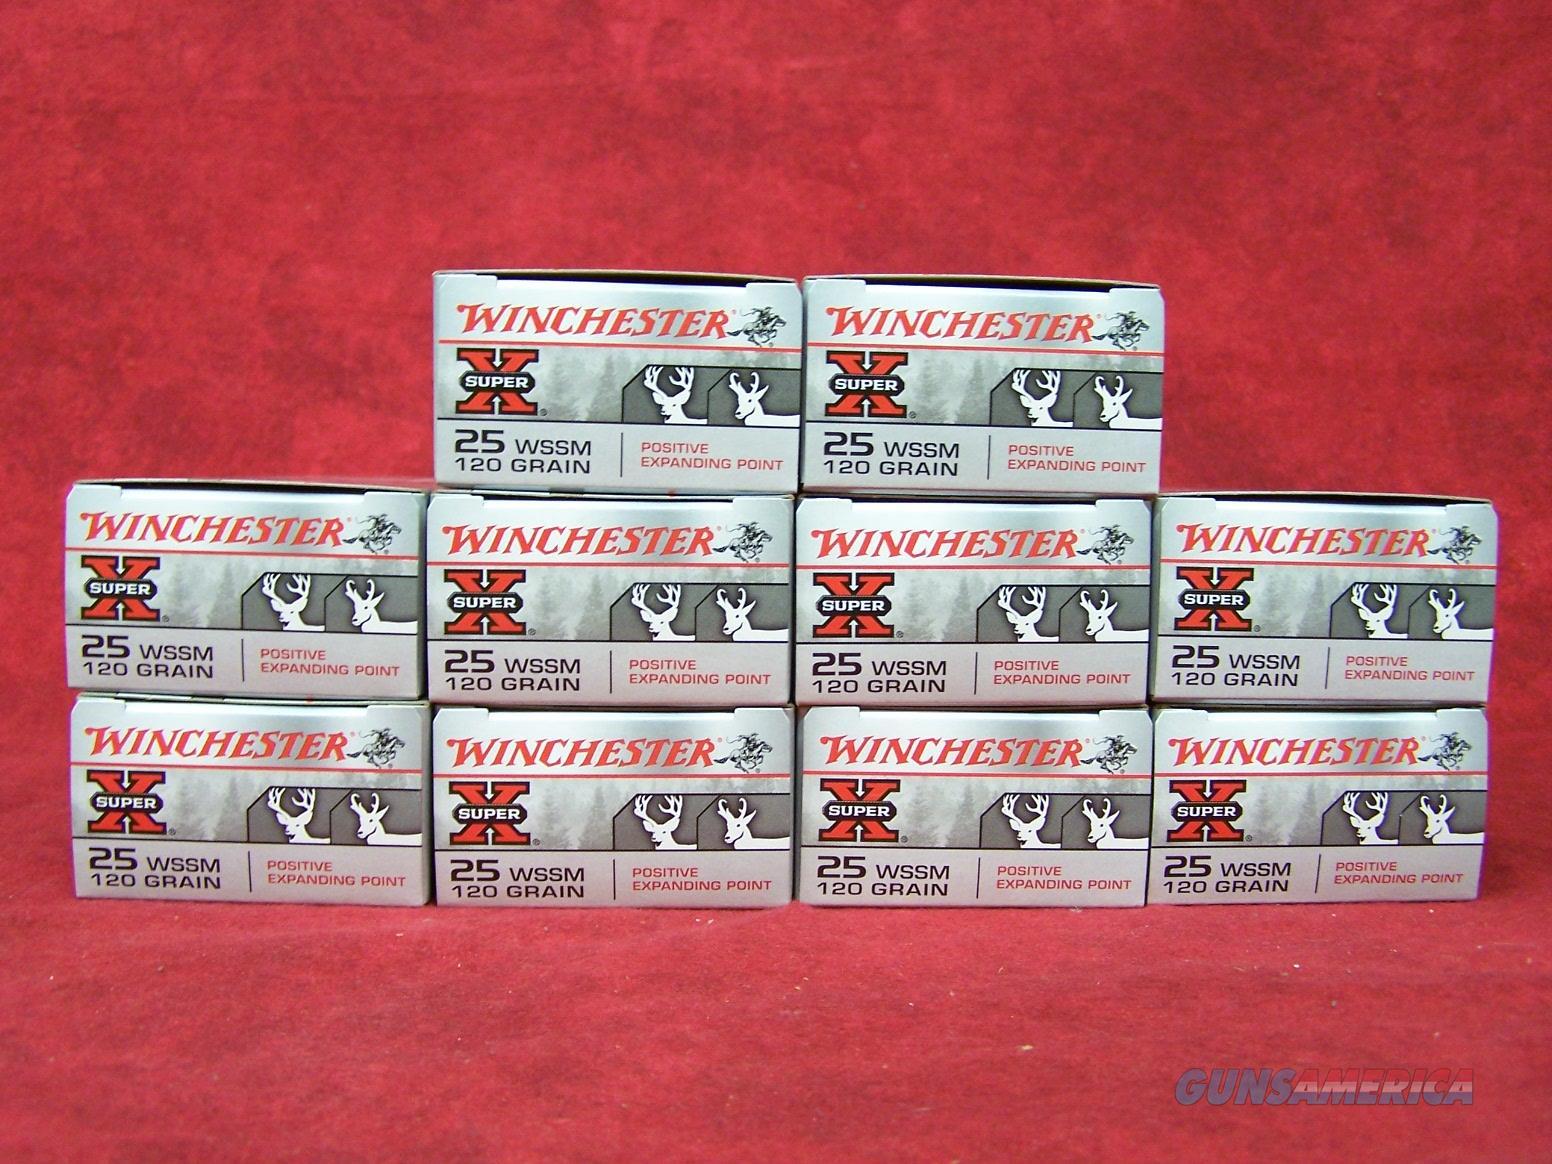 Winchester Super X 25 WSSM 120 Grain (10 boxes of 20--200 Rounds)  Non-Guns > Ammunition